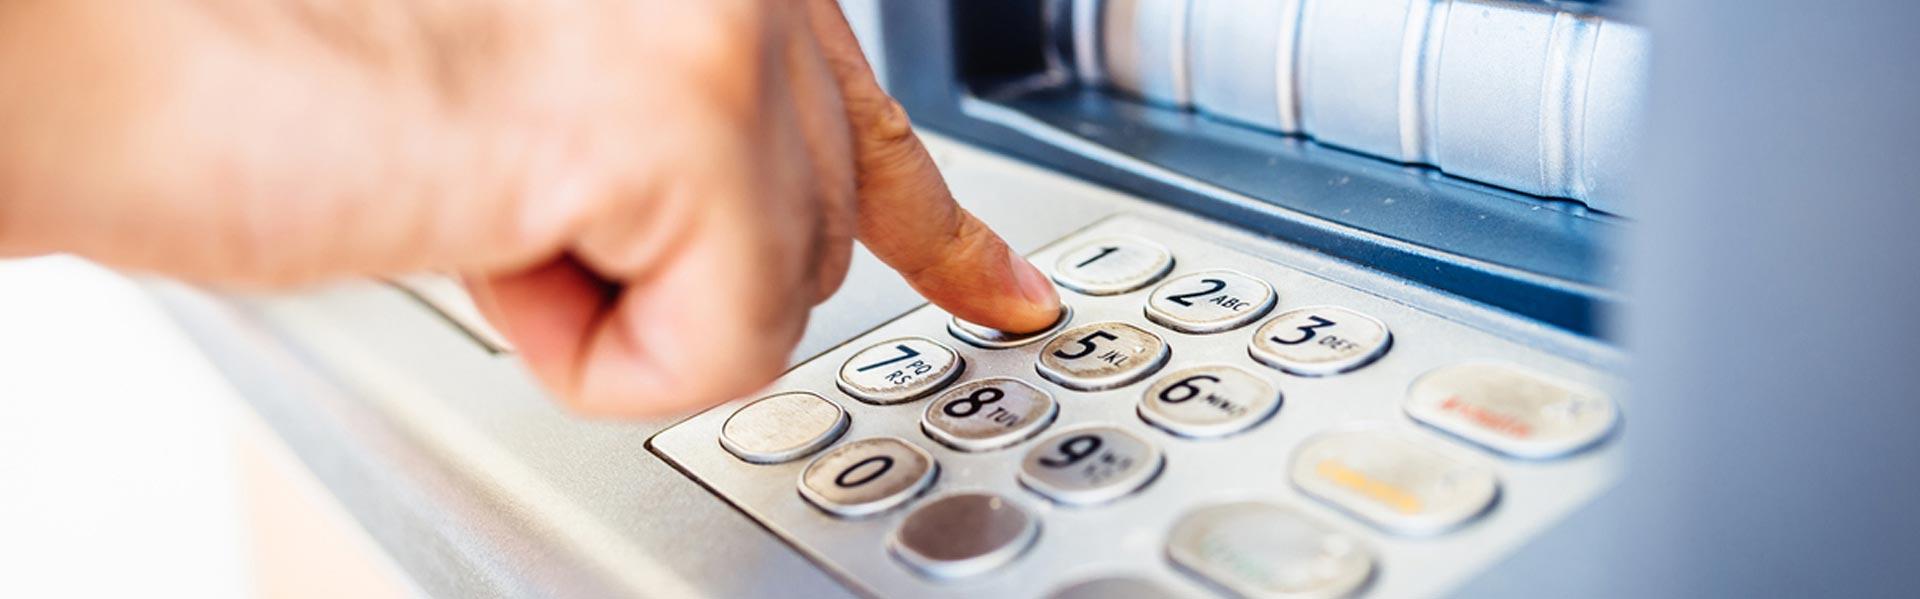 IBC Bank ATM/Debit Cards